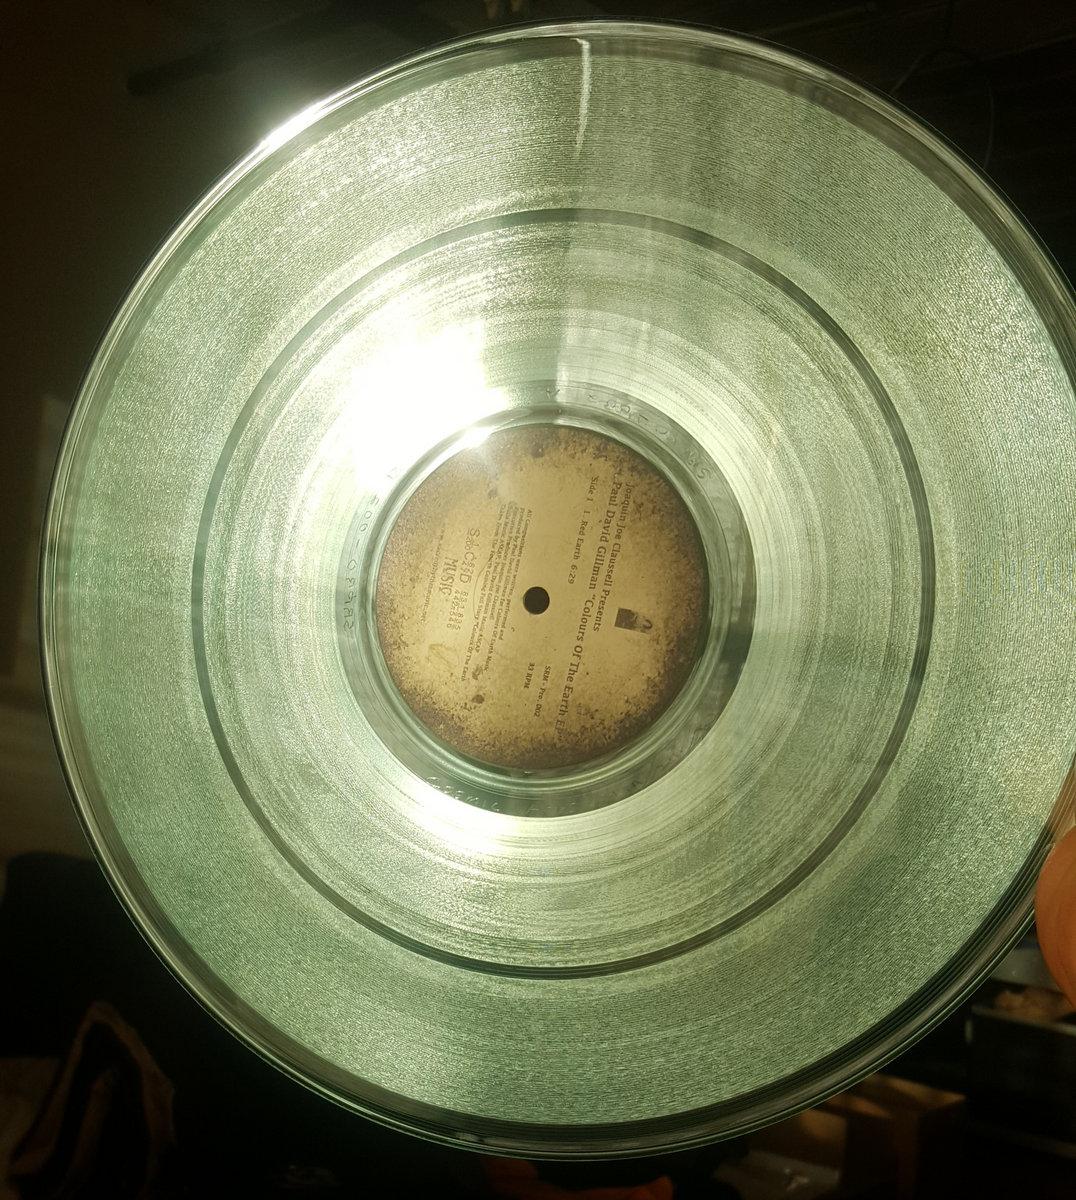 Paul David Gillman Presents: Colours of the Earth EP - 12 ...